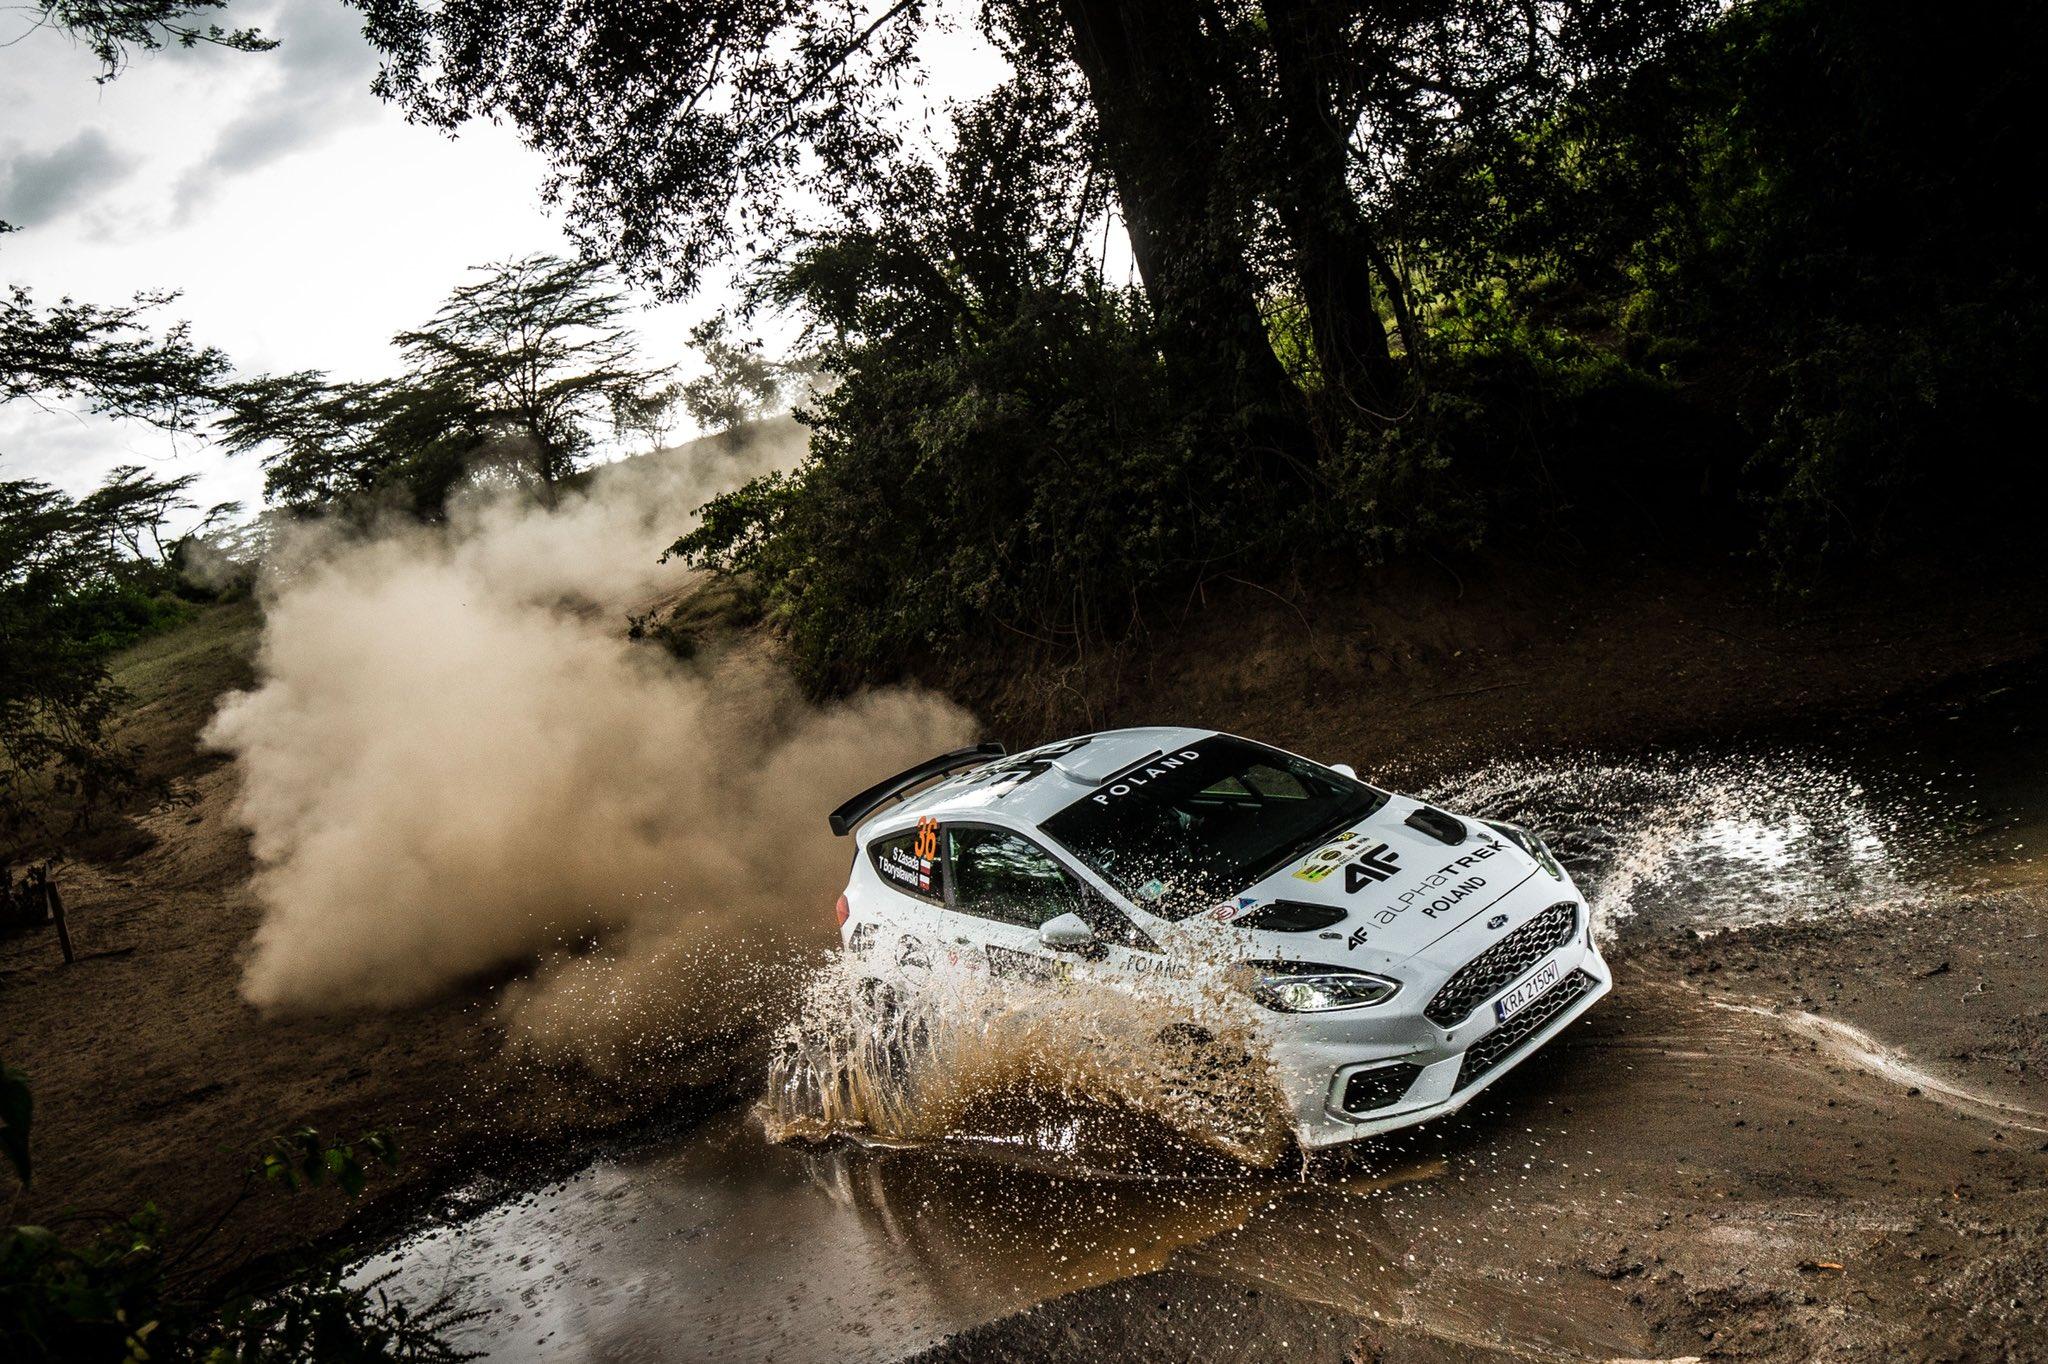 WRC: Safari Rally Kenya [23-27 Junio] - Página 6 E45eVvzXEAcYVFE?format=jpg&name=large